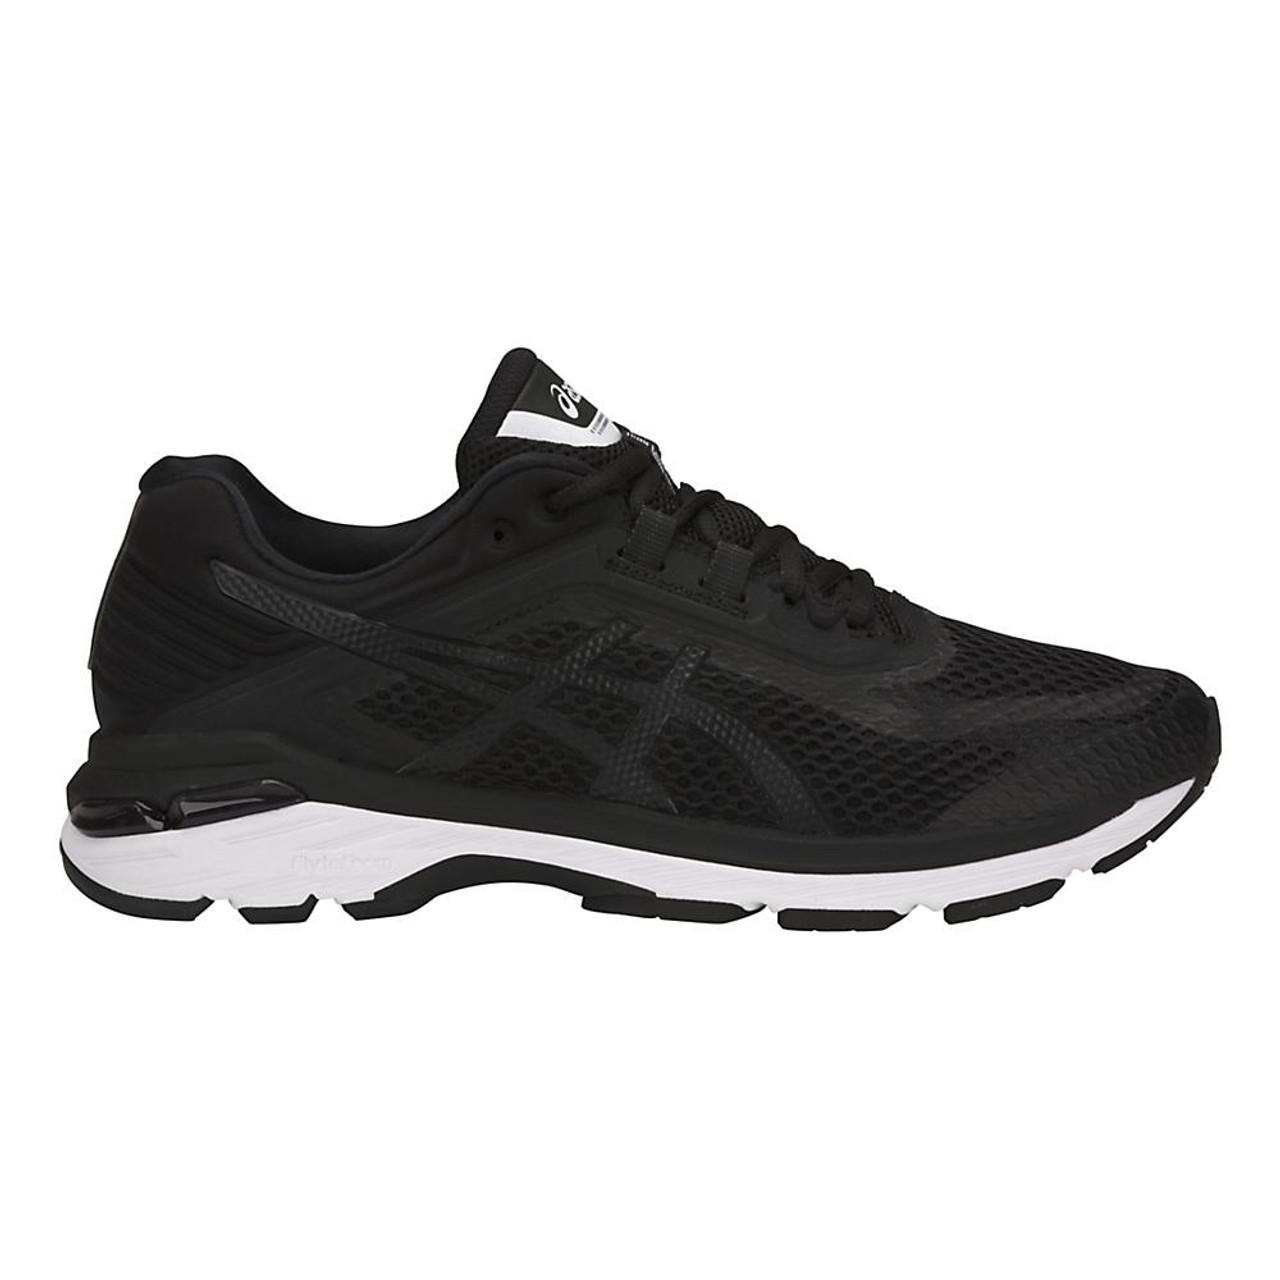 Men's ASICS GT-2000 6 Running Shoes